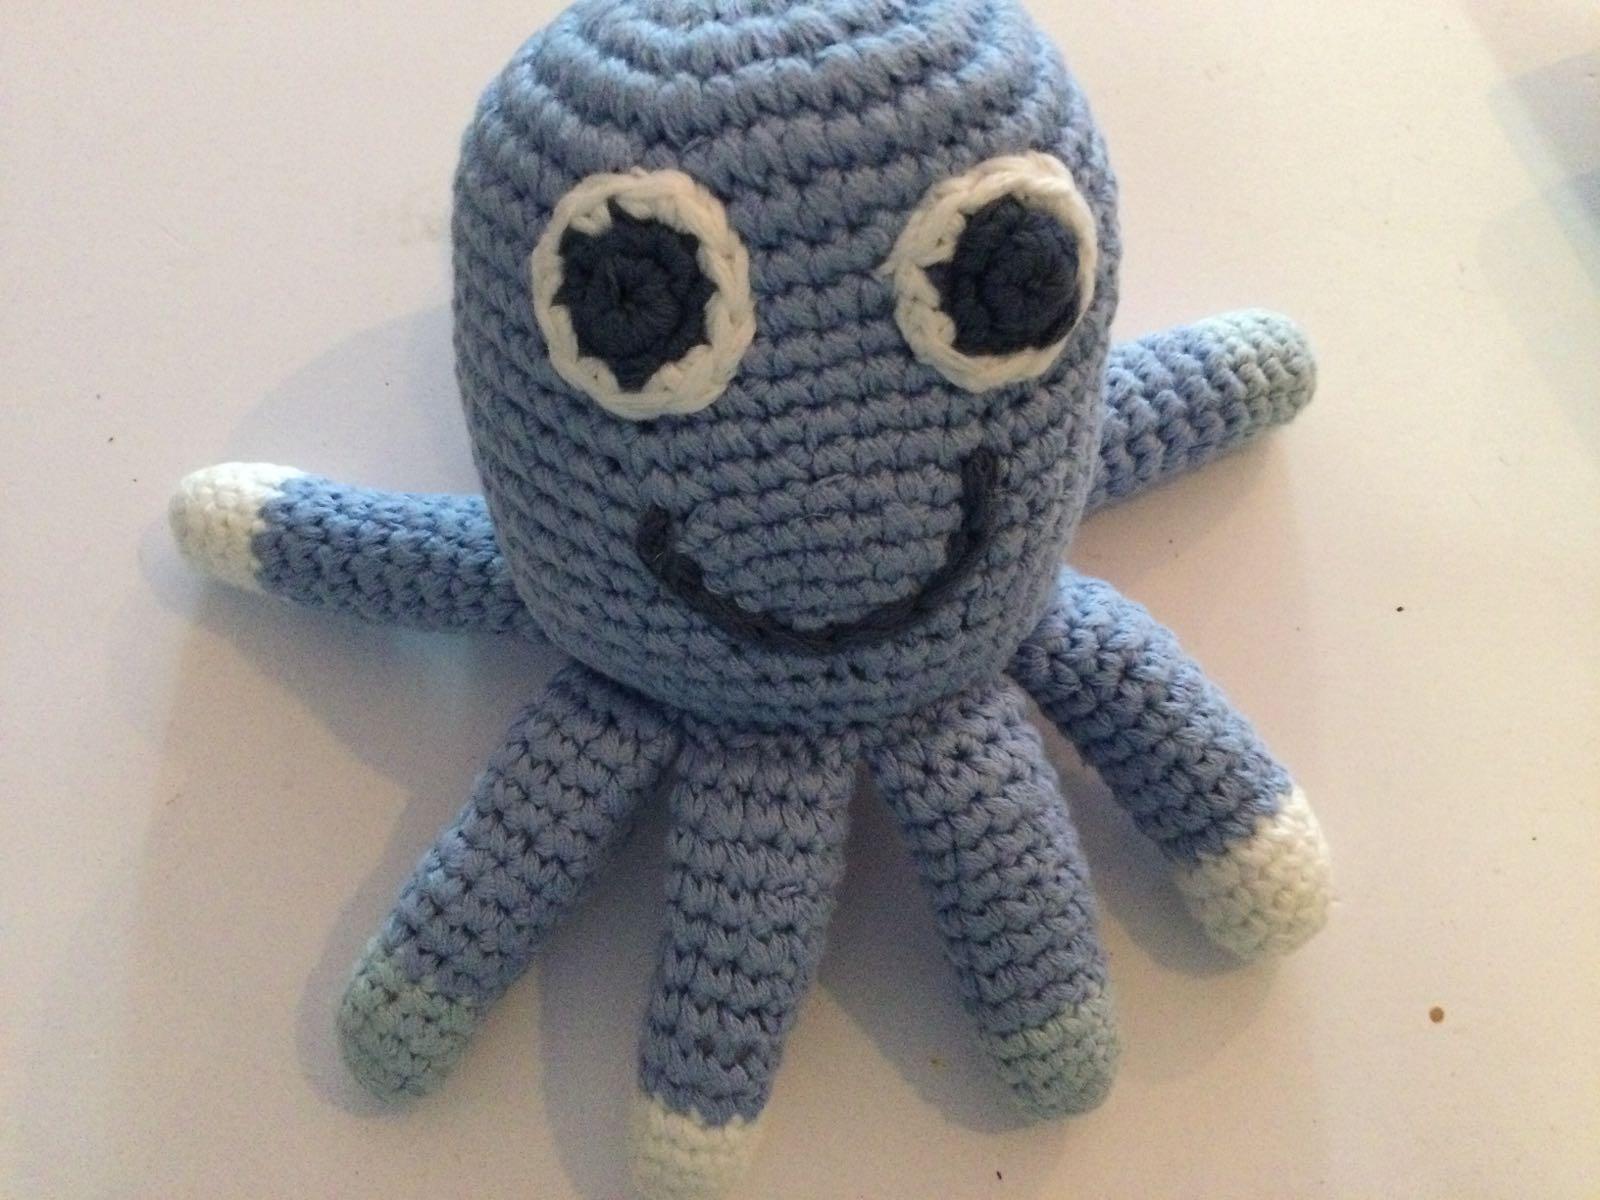 Pebble - Crochet Octopus Rattle - Flower Blue